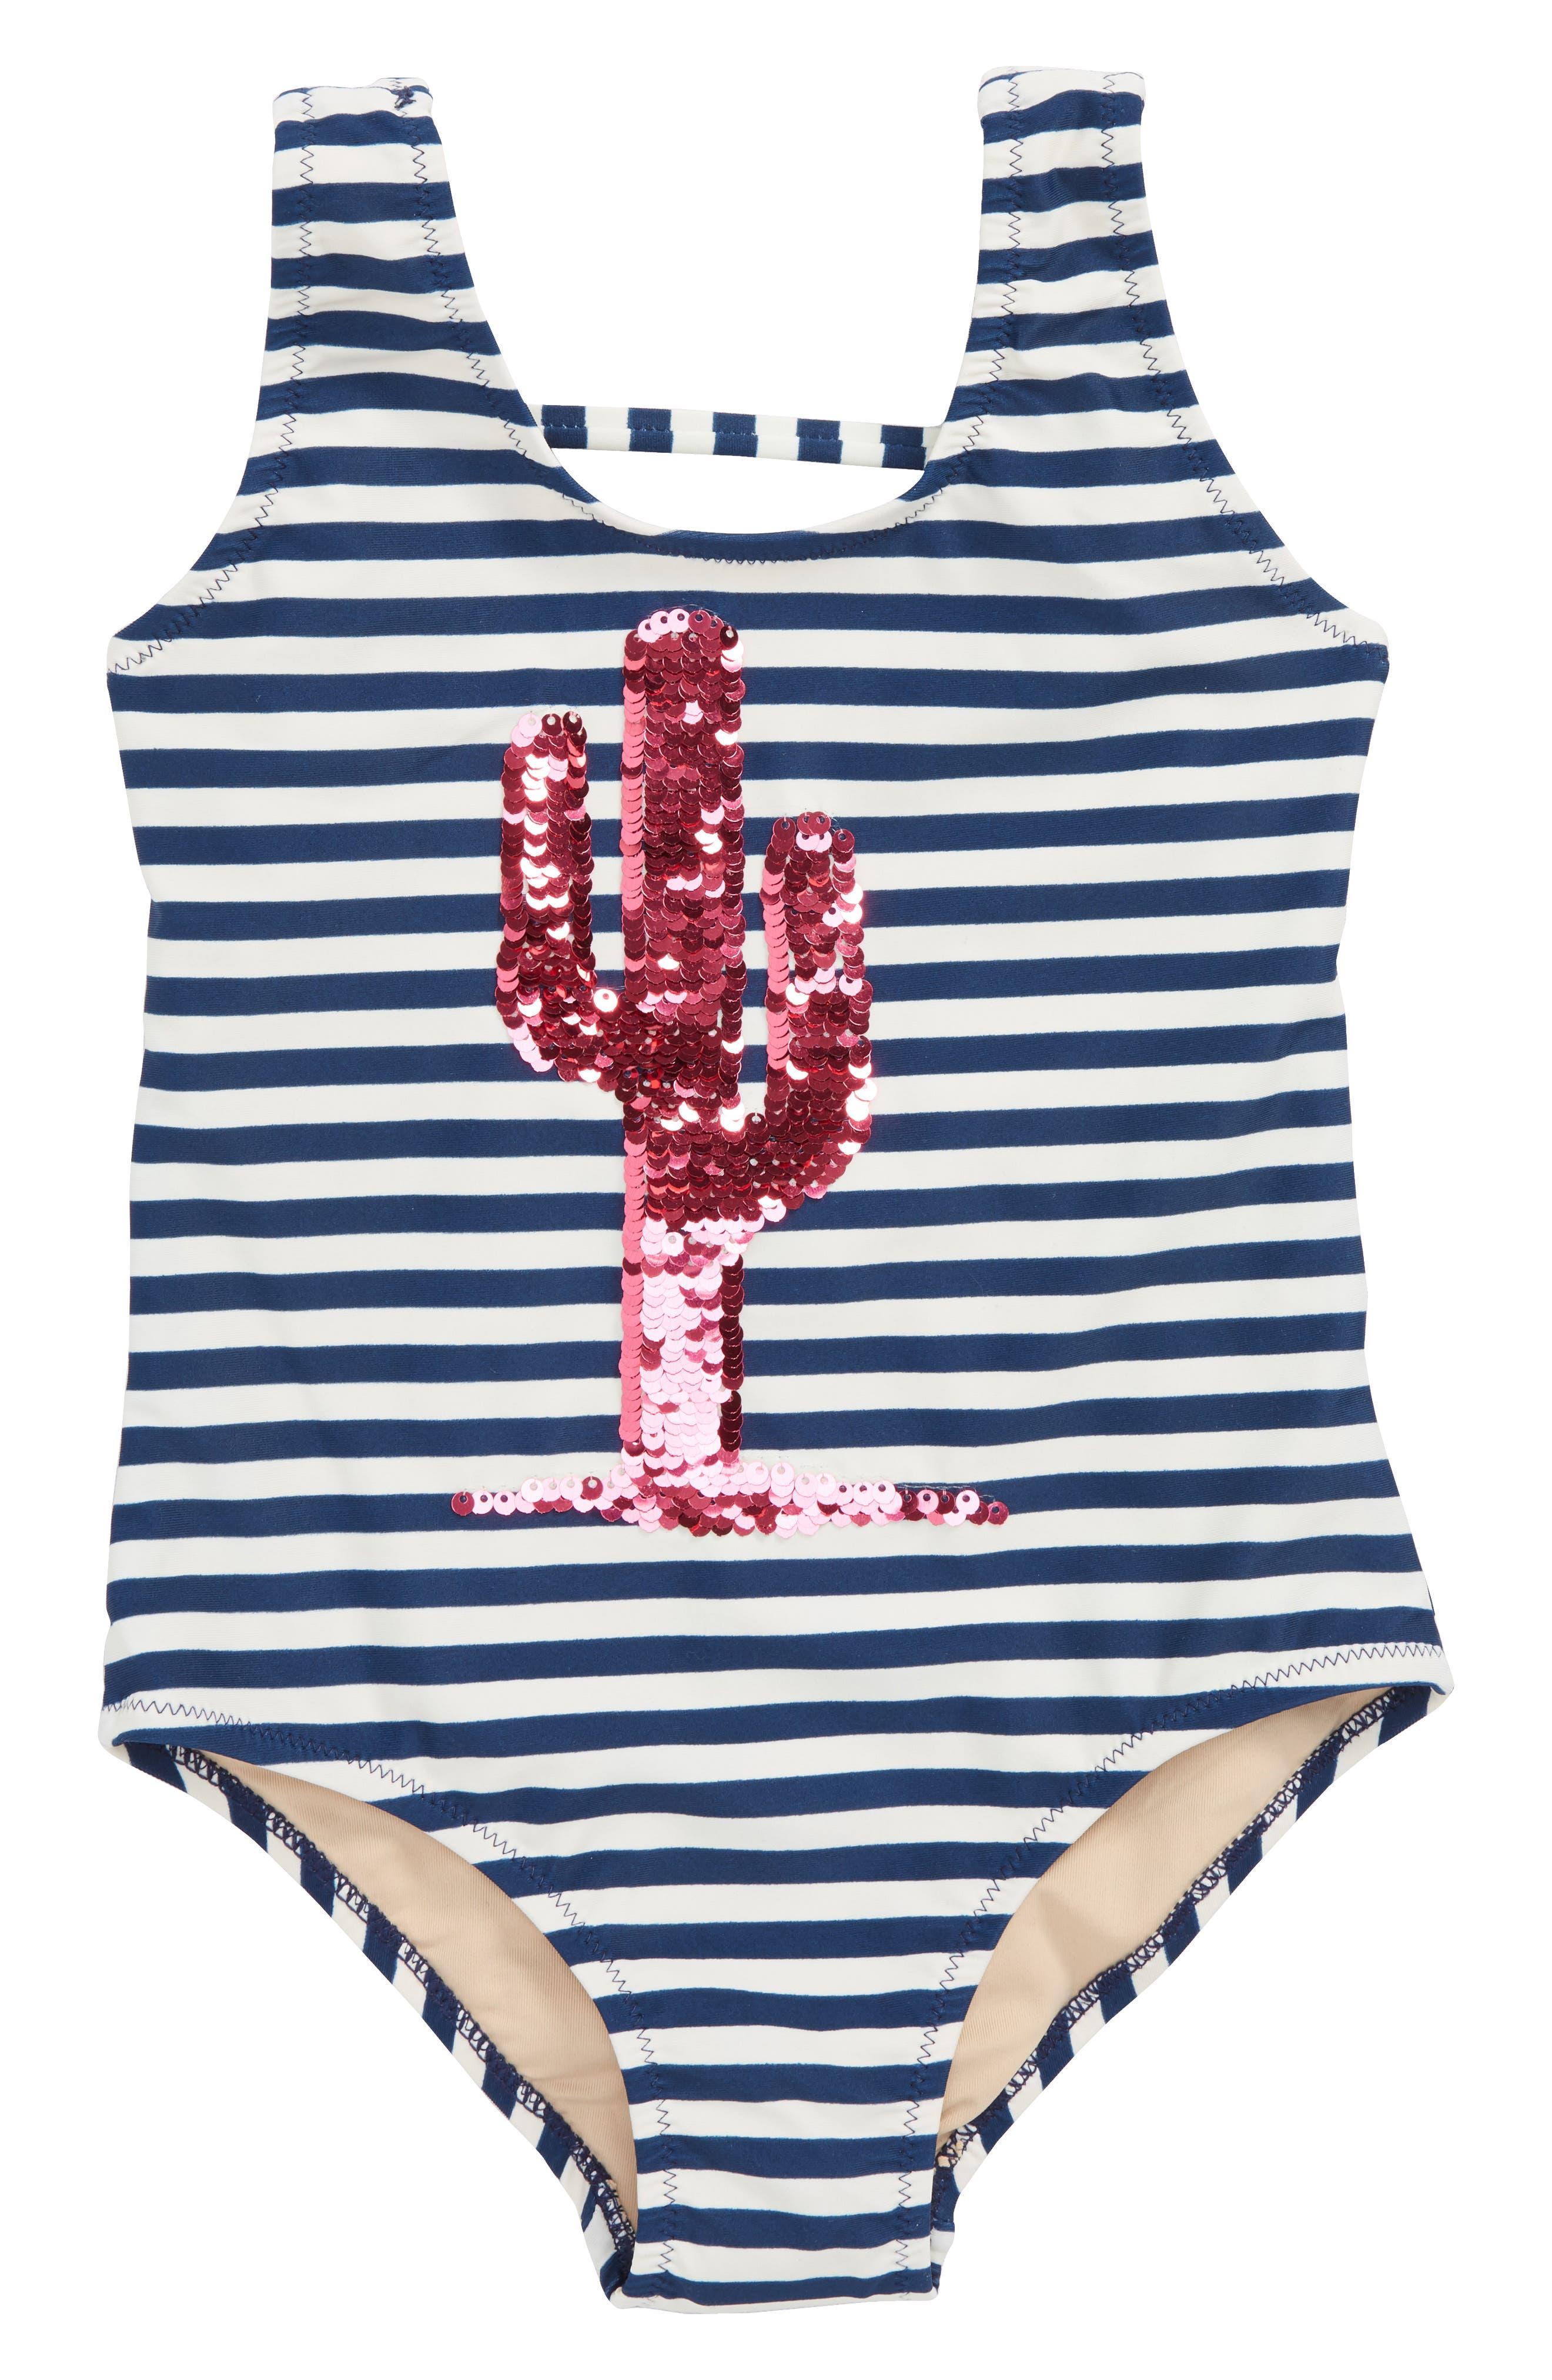 Shade Critters Flip Sequin Cactus One-Piece Swimsuit (Toddler Girls & Little Girls)